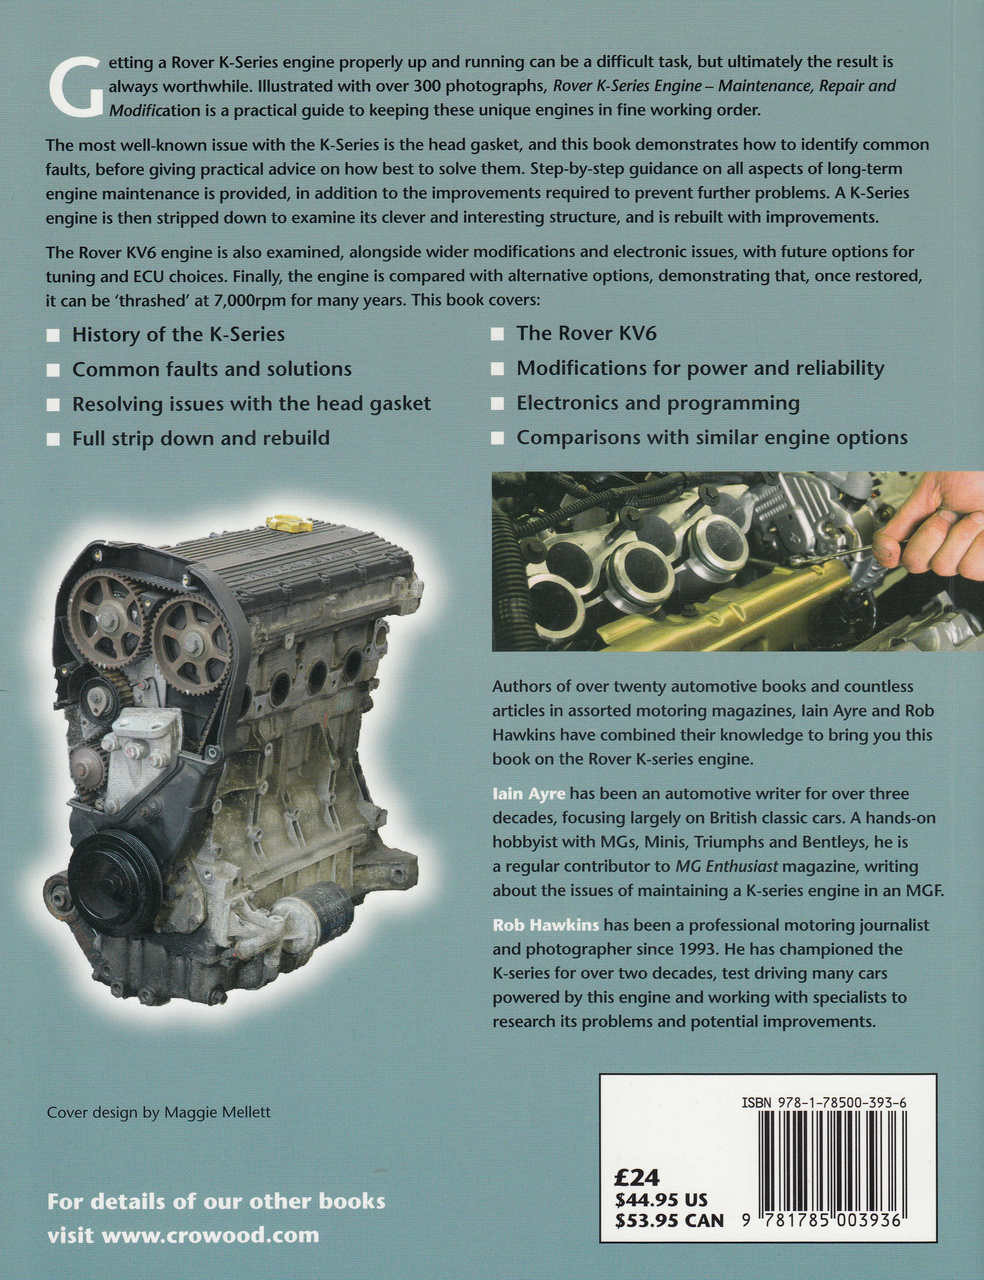 Rover K-Series Engine (Maintenance, Repair & Modification)